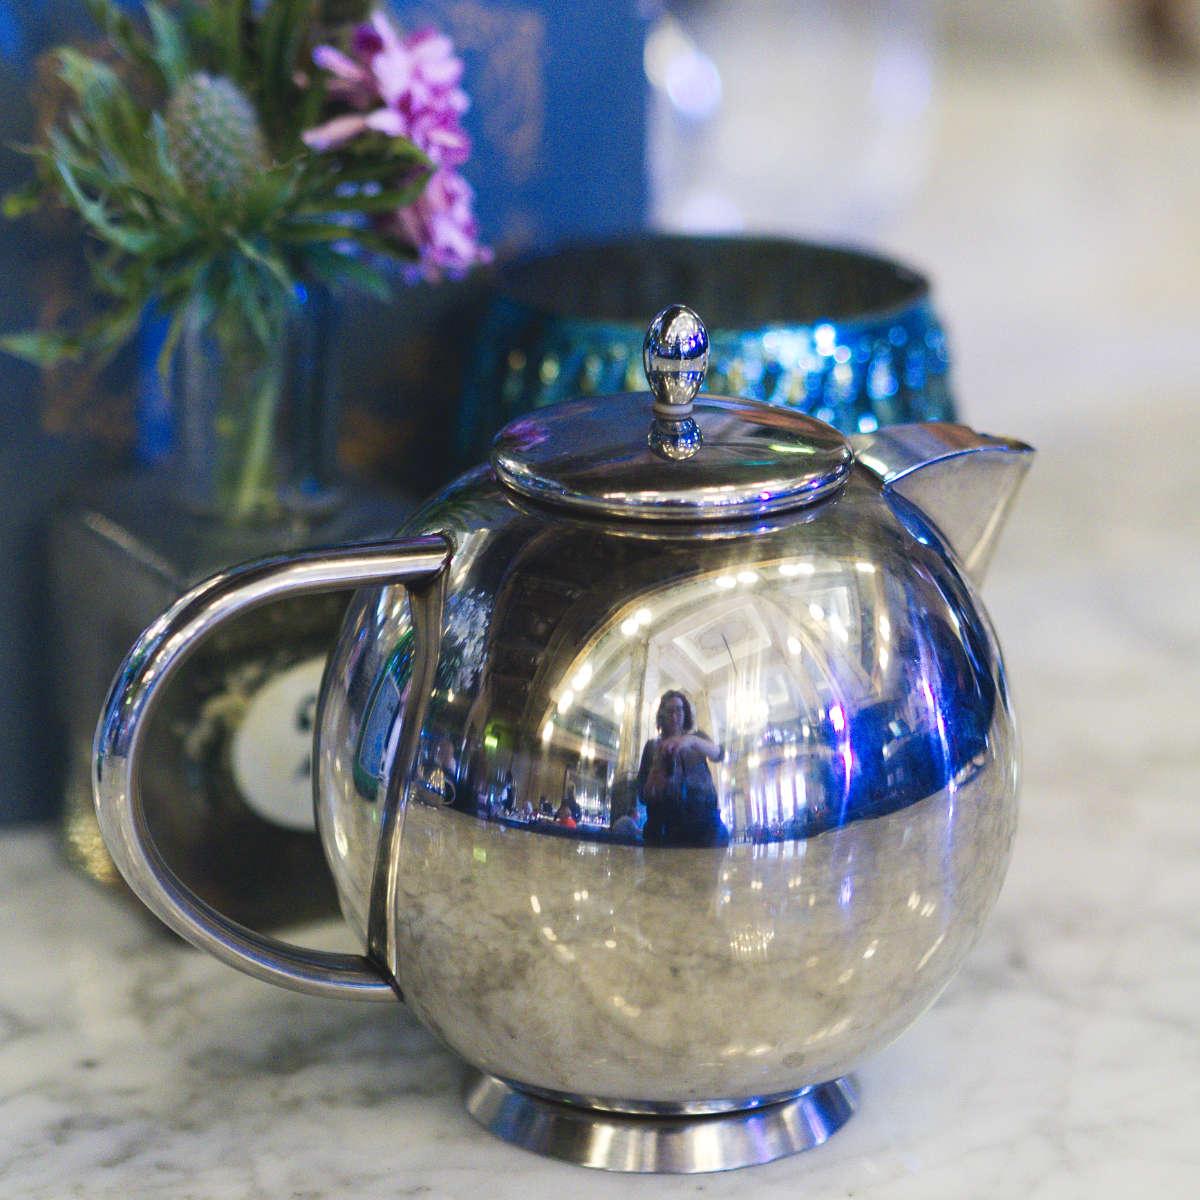 Teapot at The Grand Cafe, Edinburgh